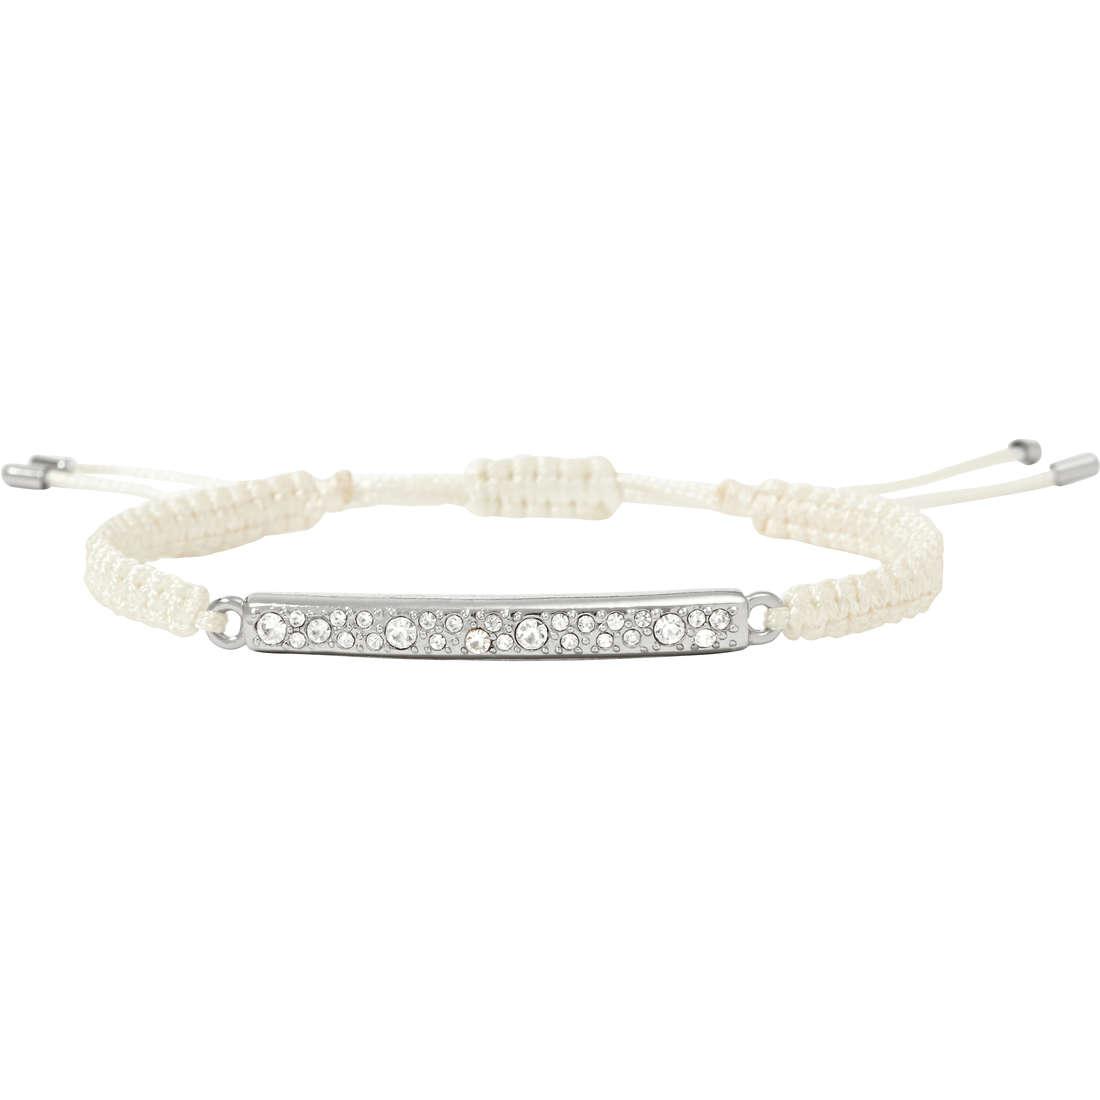 bracelet woman jewellery Fossil JA6290040